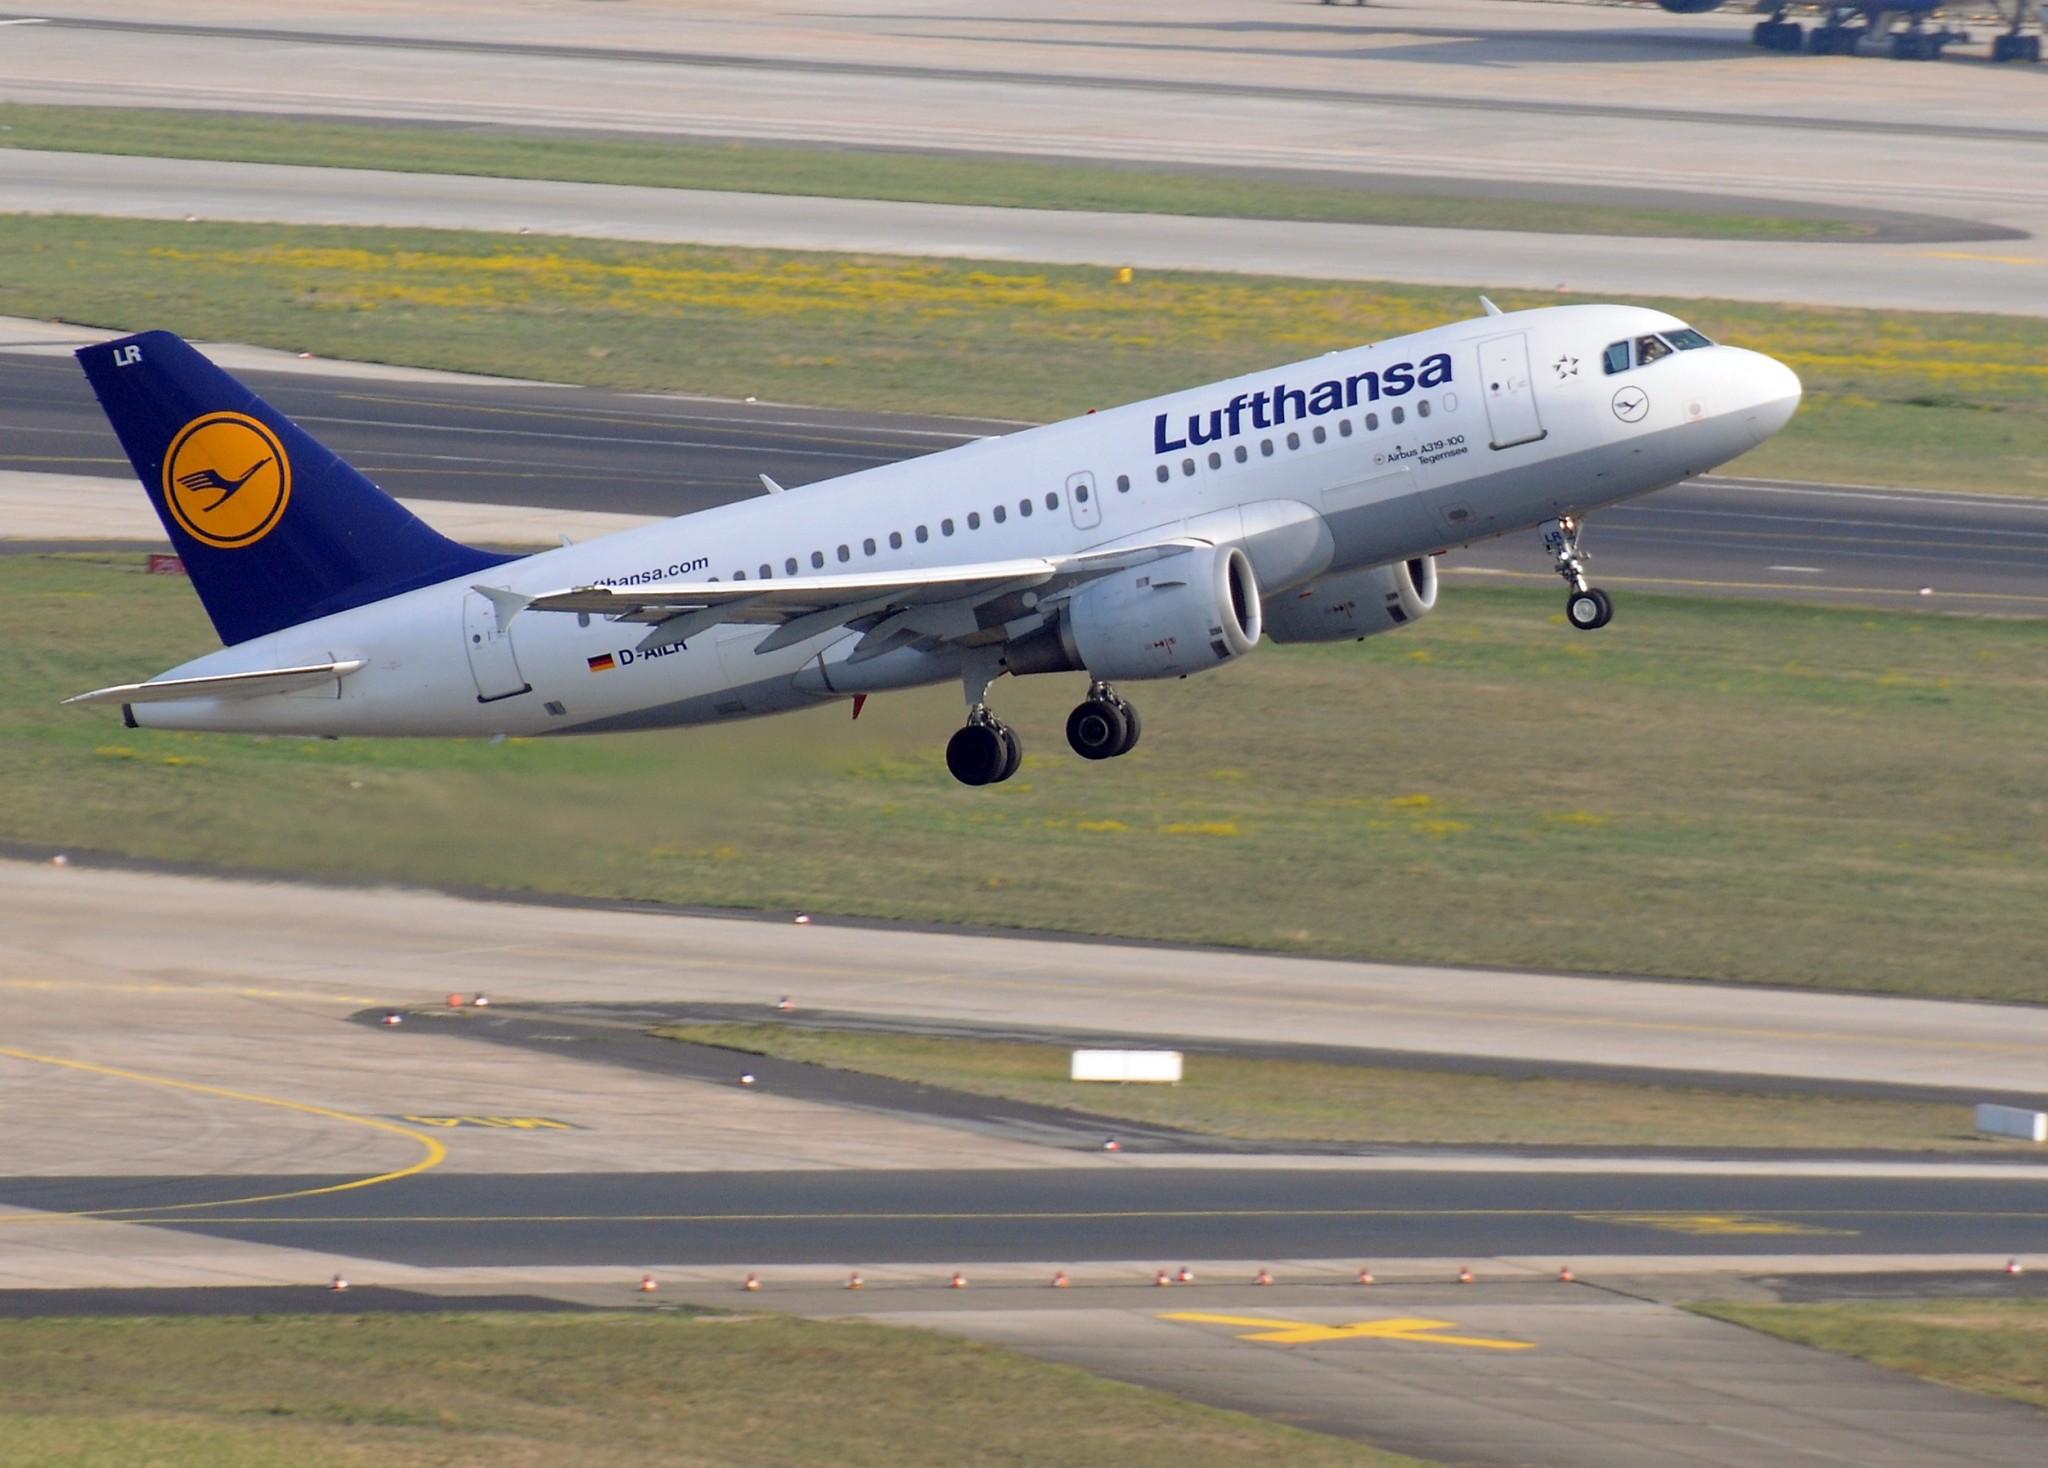 lufthansa-announces-new-shannon-frankfurt-route